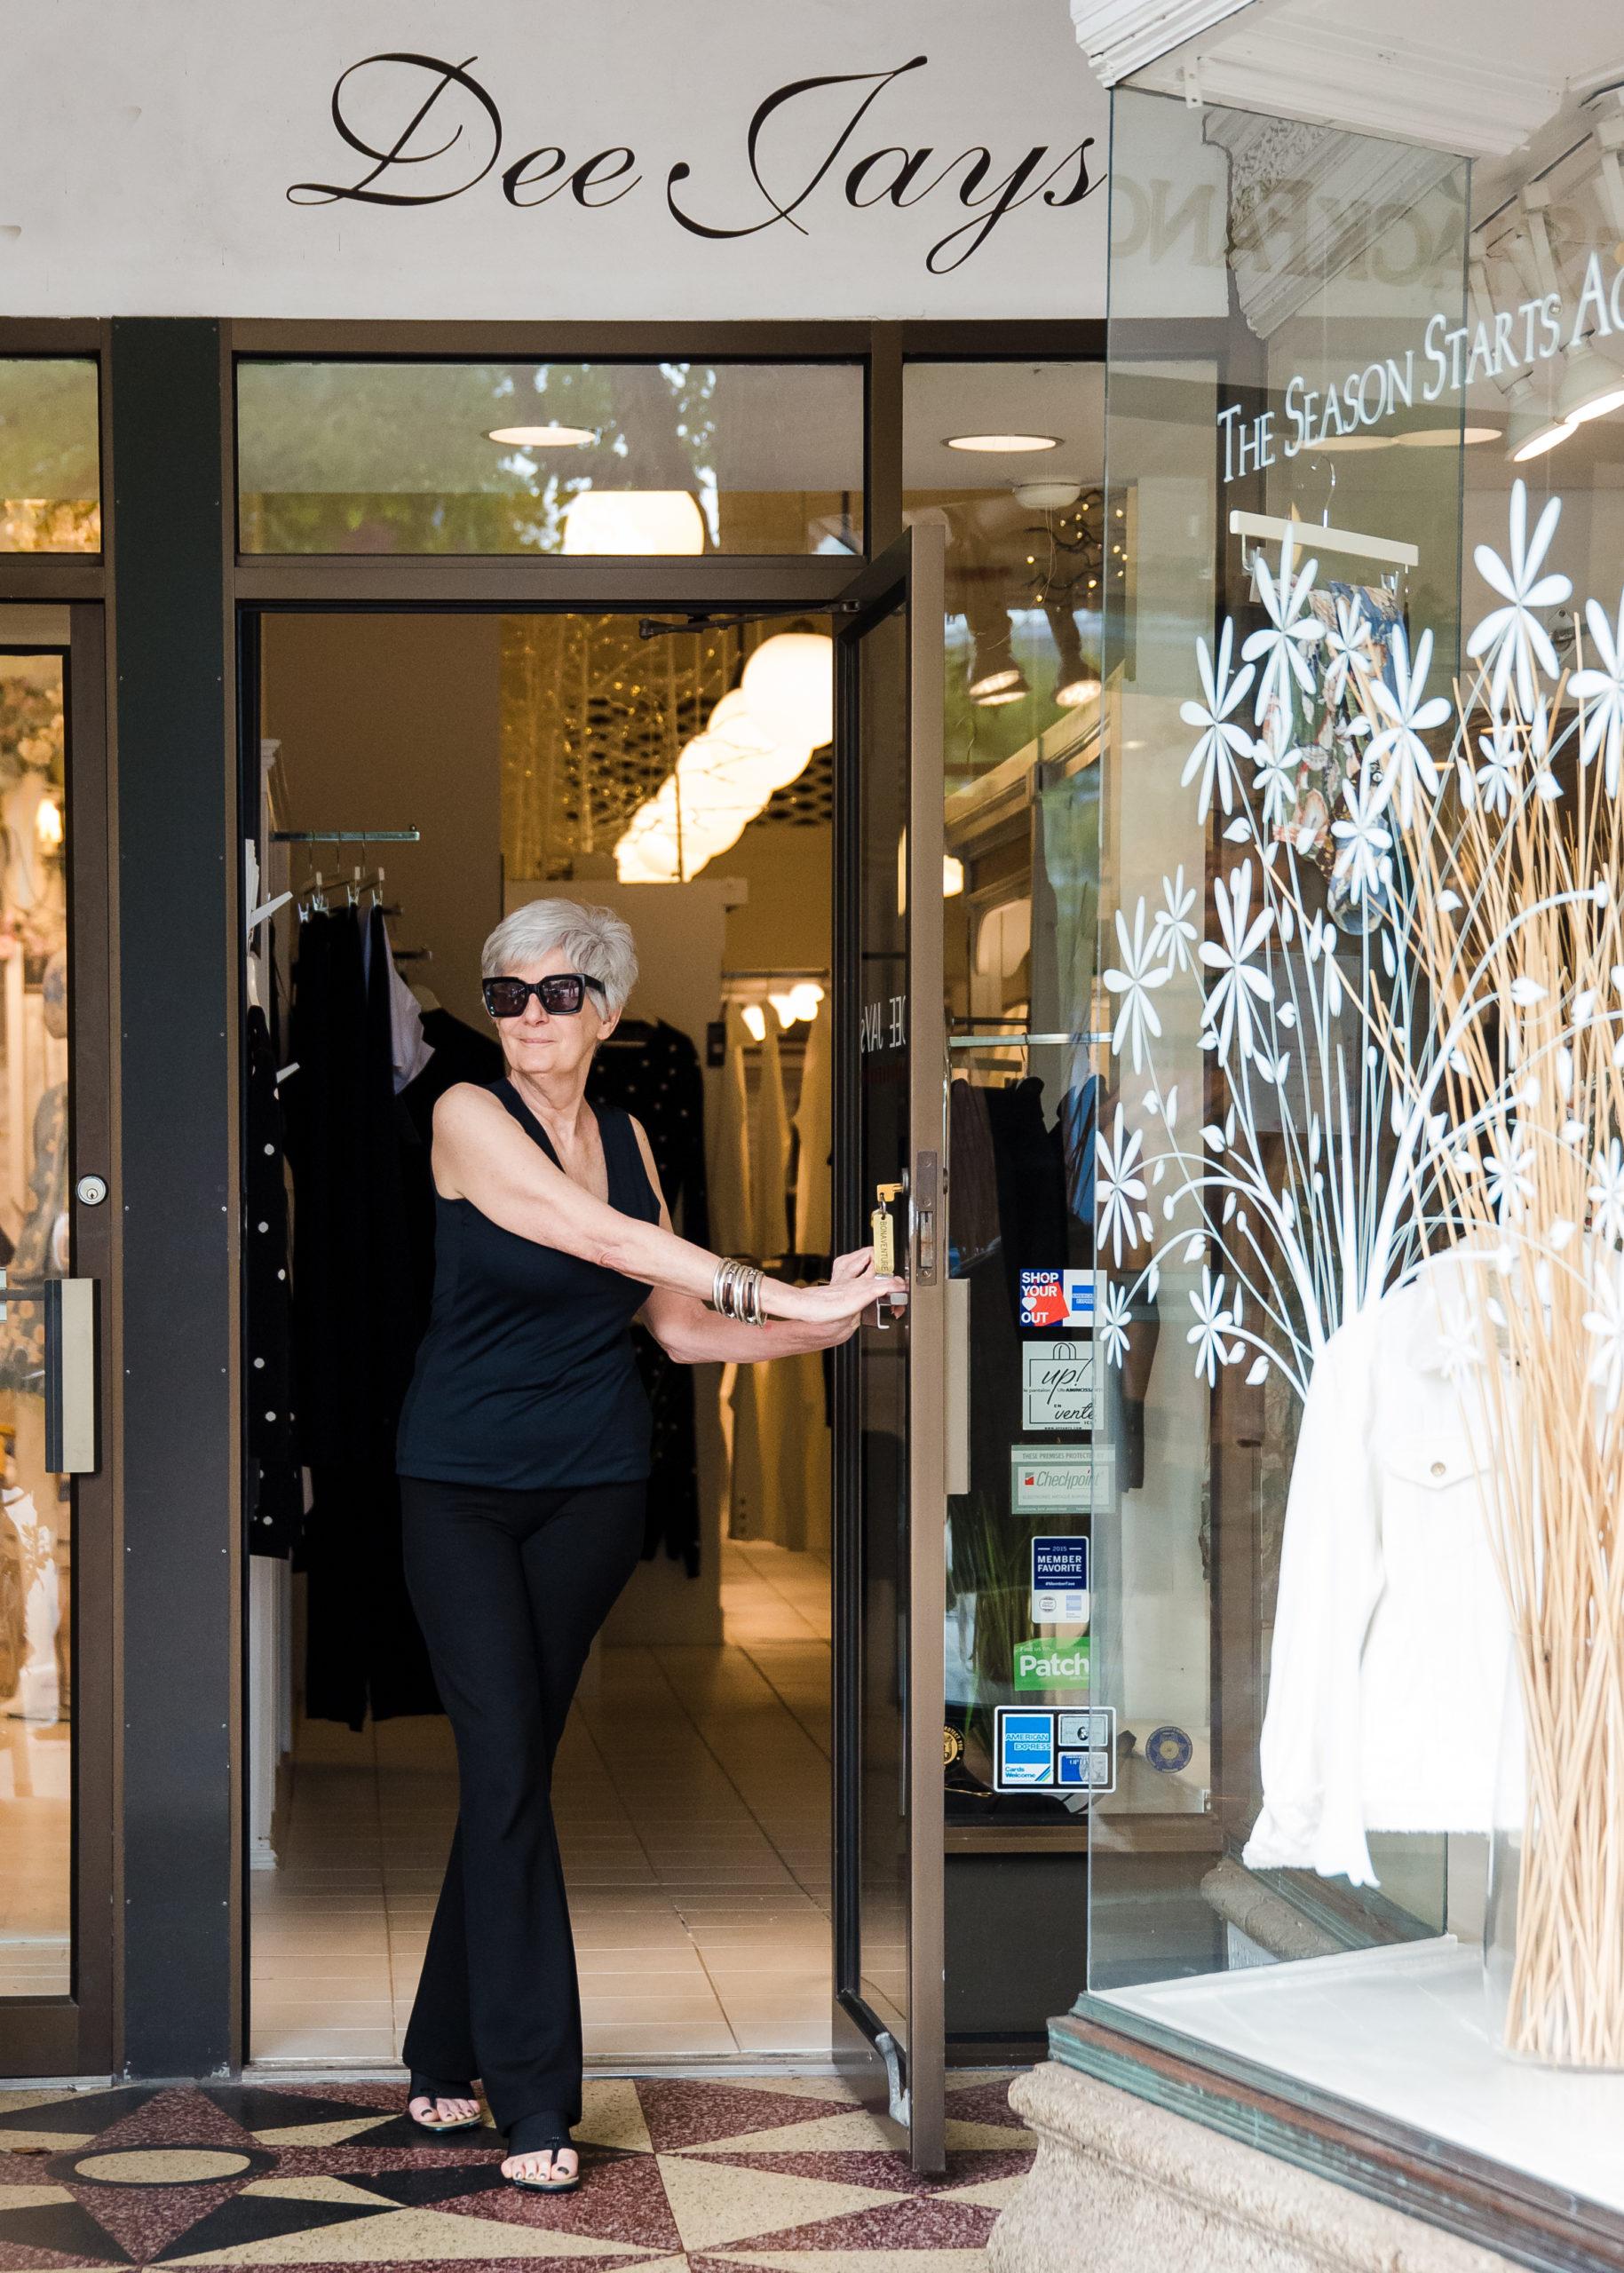 Deborah Ohana has built a loyal customer base in the more than 40 years that she's operated the Southampton Village clothing store, DeeJay's, on Main Street alongside her husband, Jack Ohana.